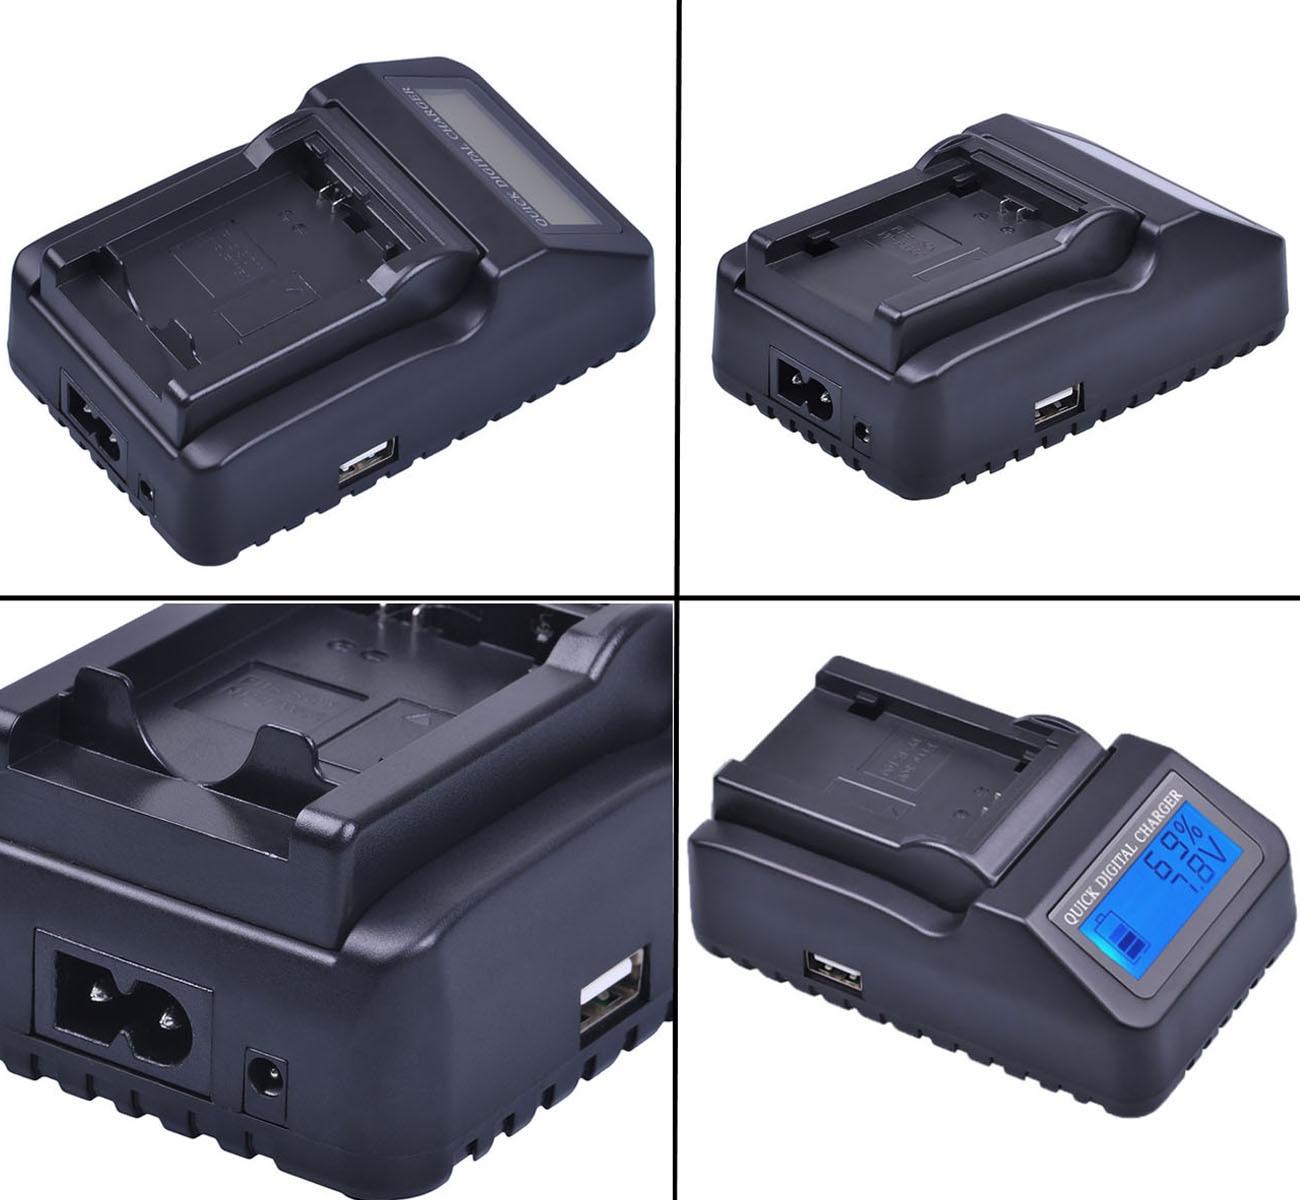 LCD Quick Battery Charger for Panasonic AG-HMC151 AG-HMC151EJ Camcorder AG-HMC151E